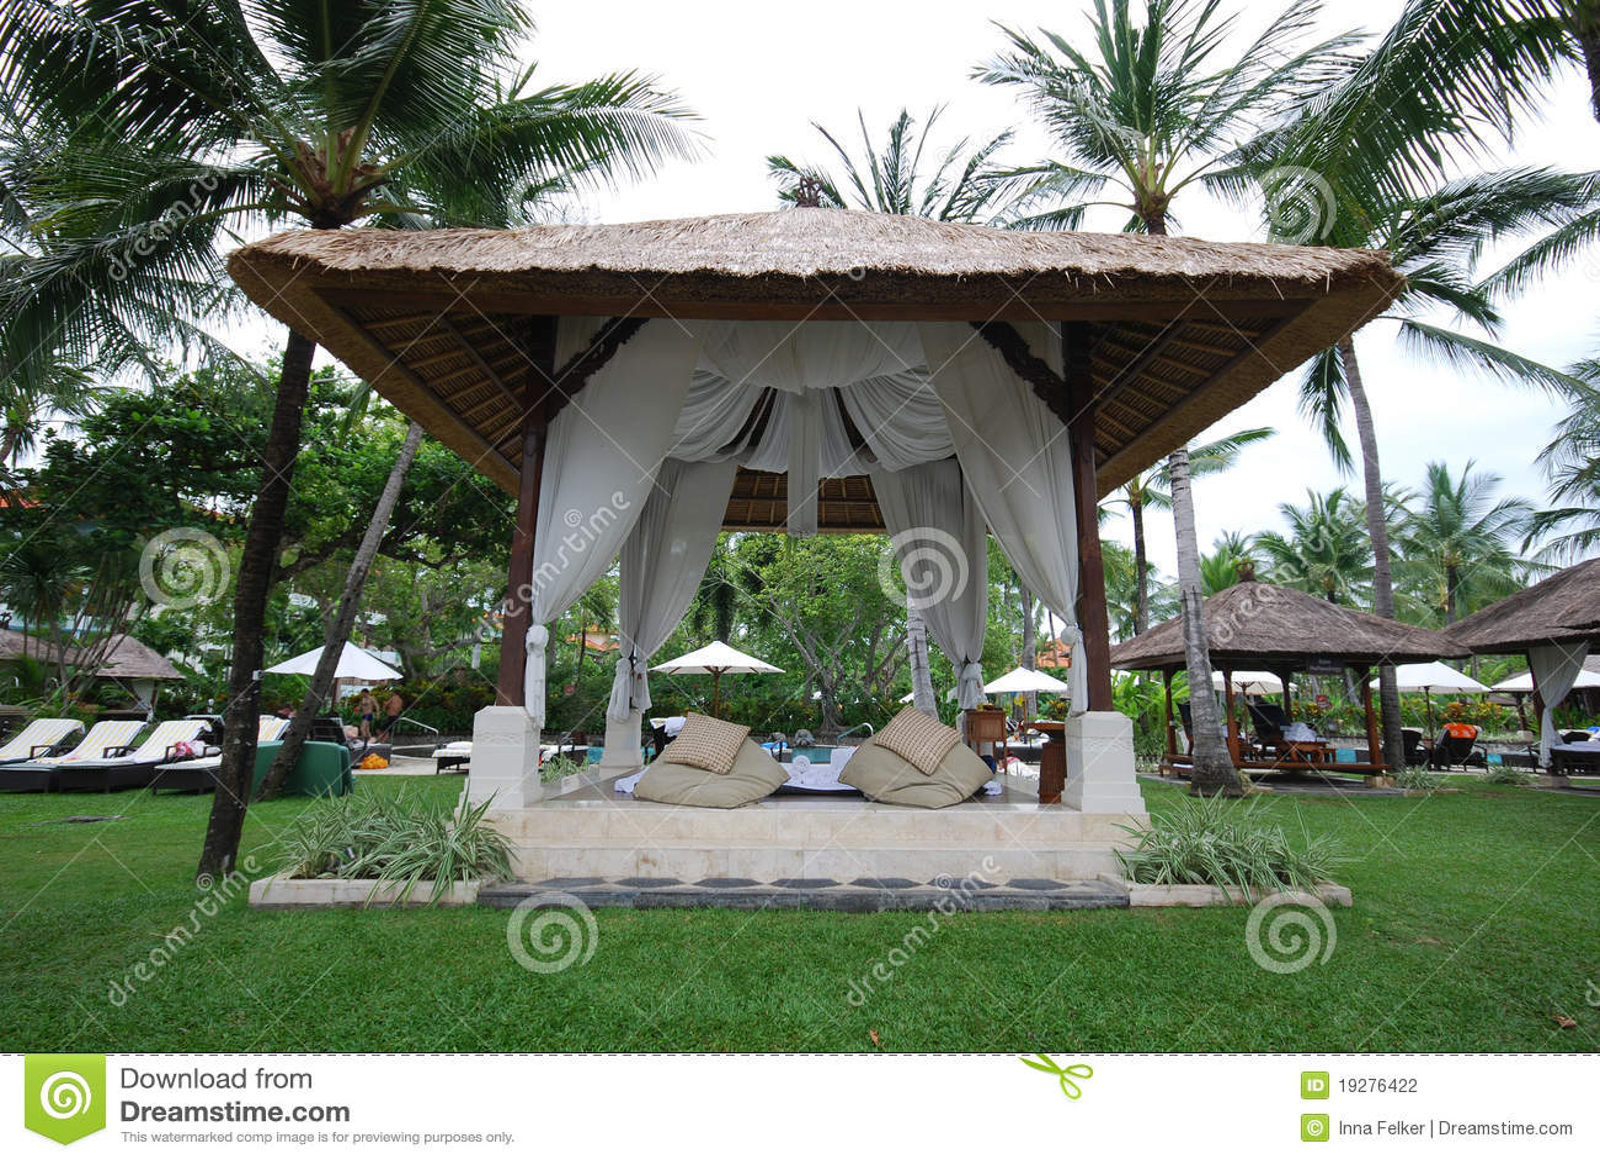 Lounge Gazebo At Tropical Resort Bali Stock Photo